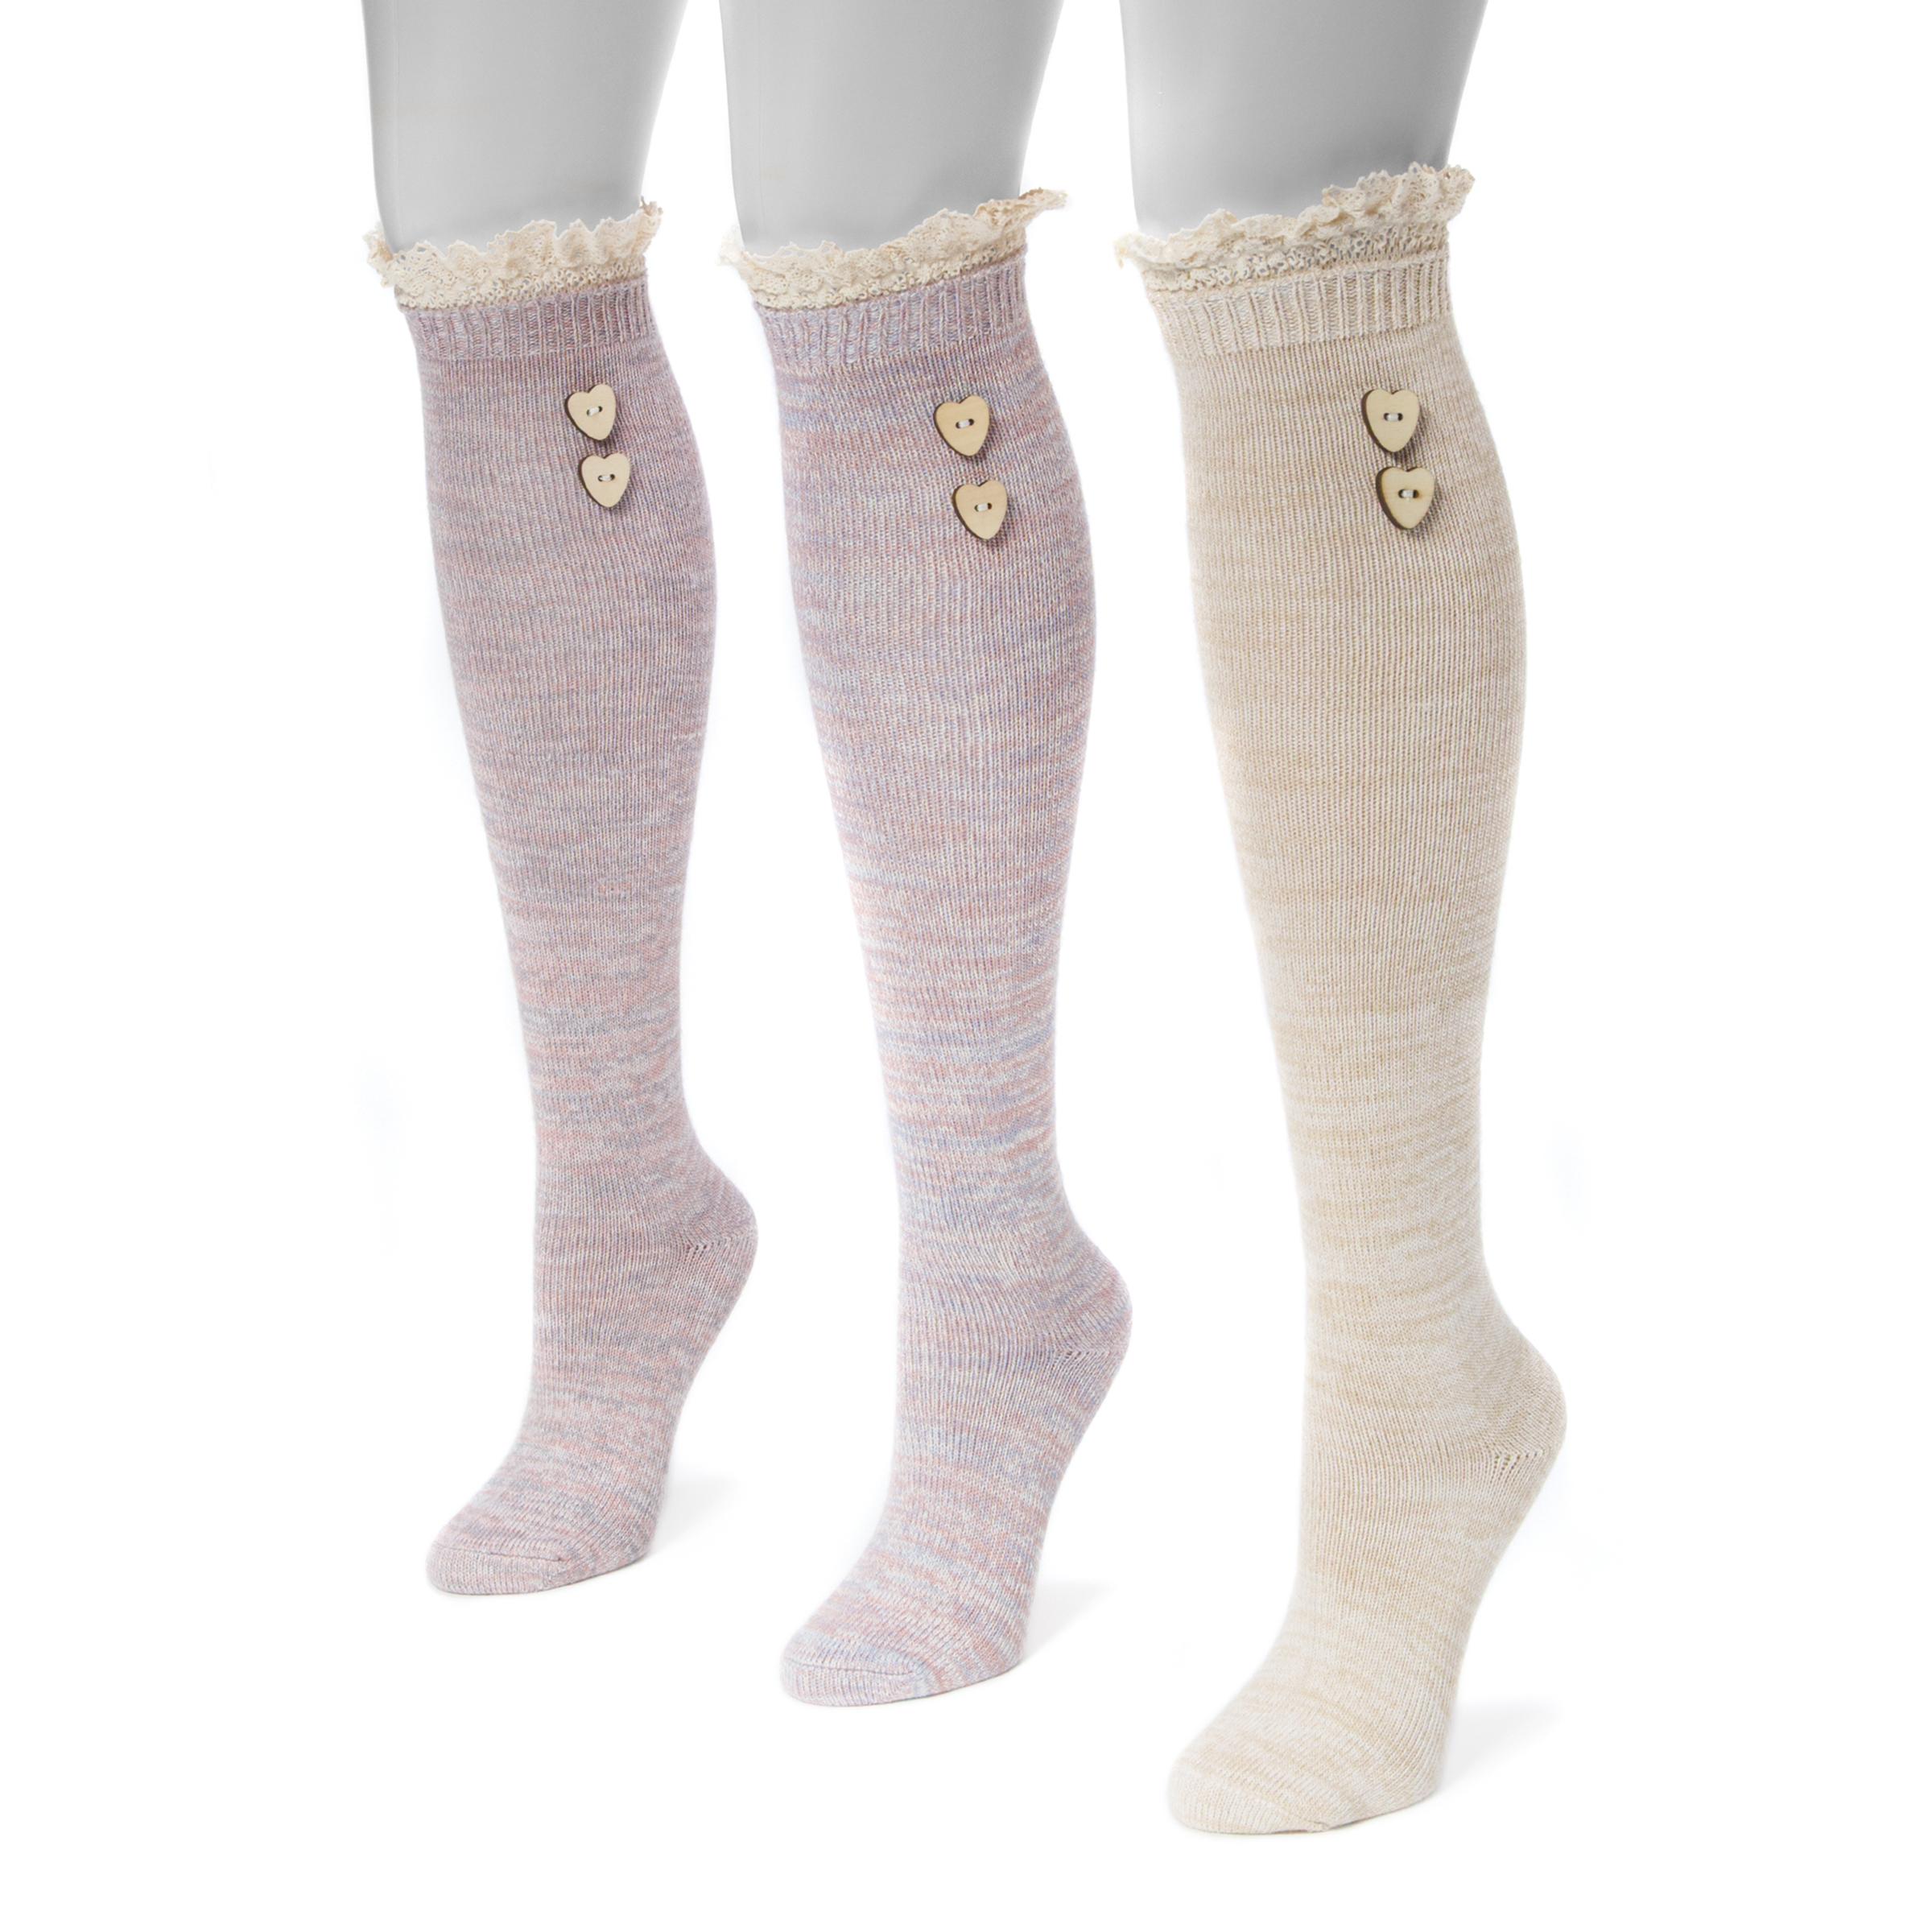 951fd7f99 MUK LUKS® Women s 3 Pair Pack Lace Top Knee High Socks